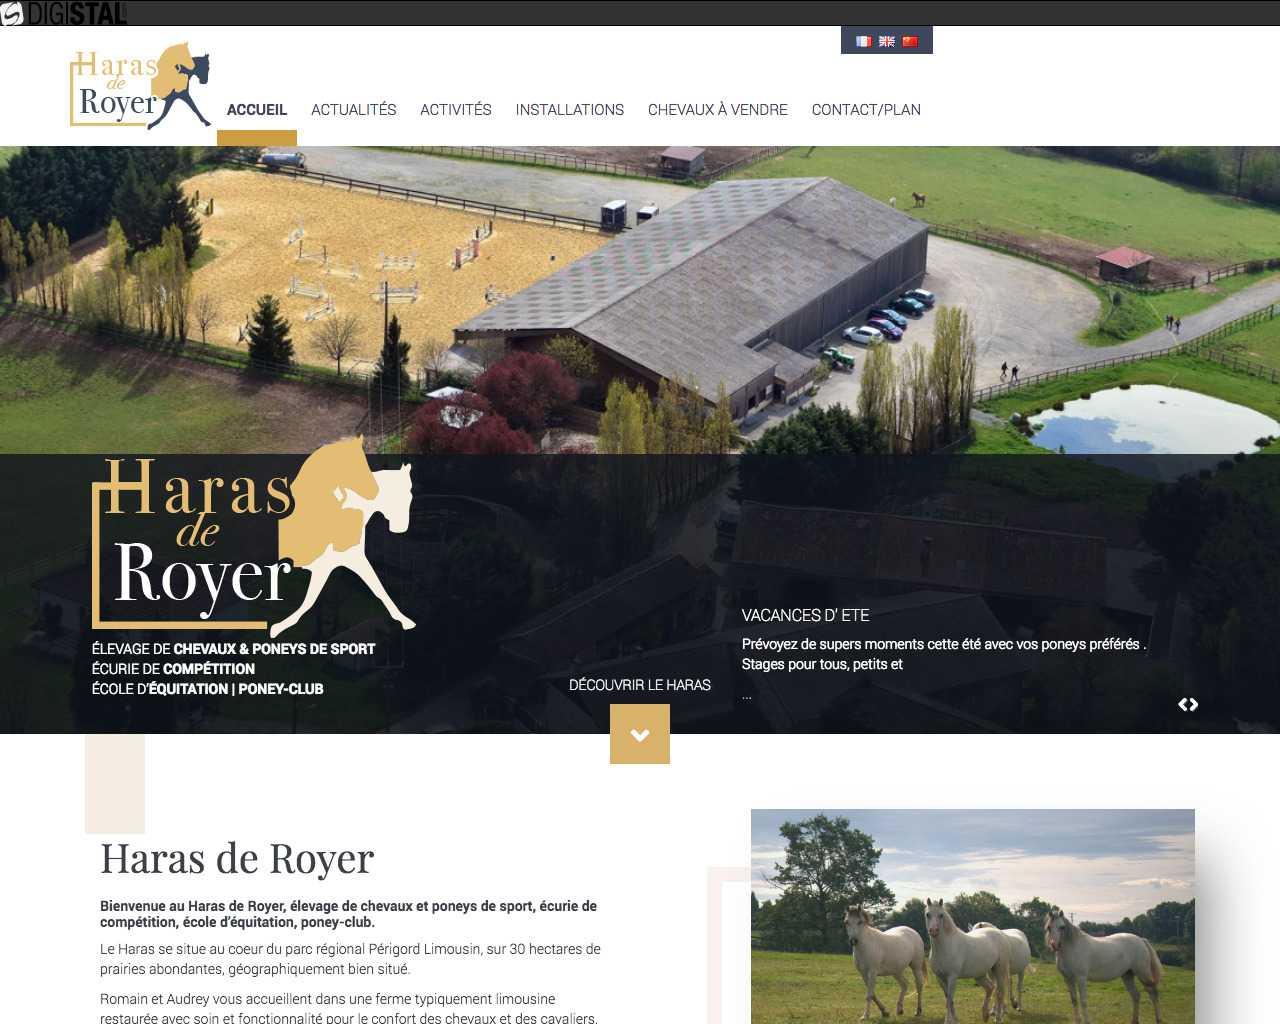 Visuel du site Haras de Royer